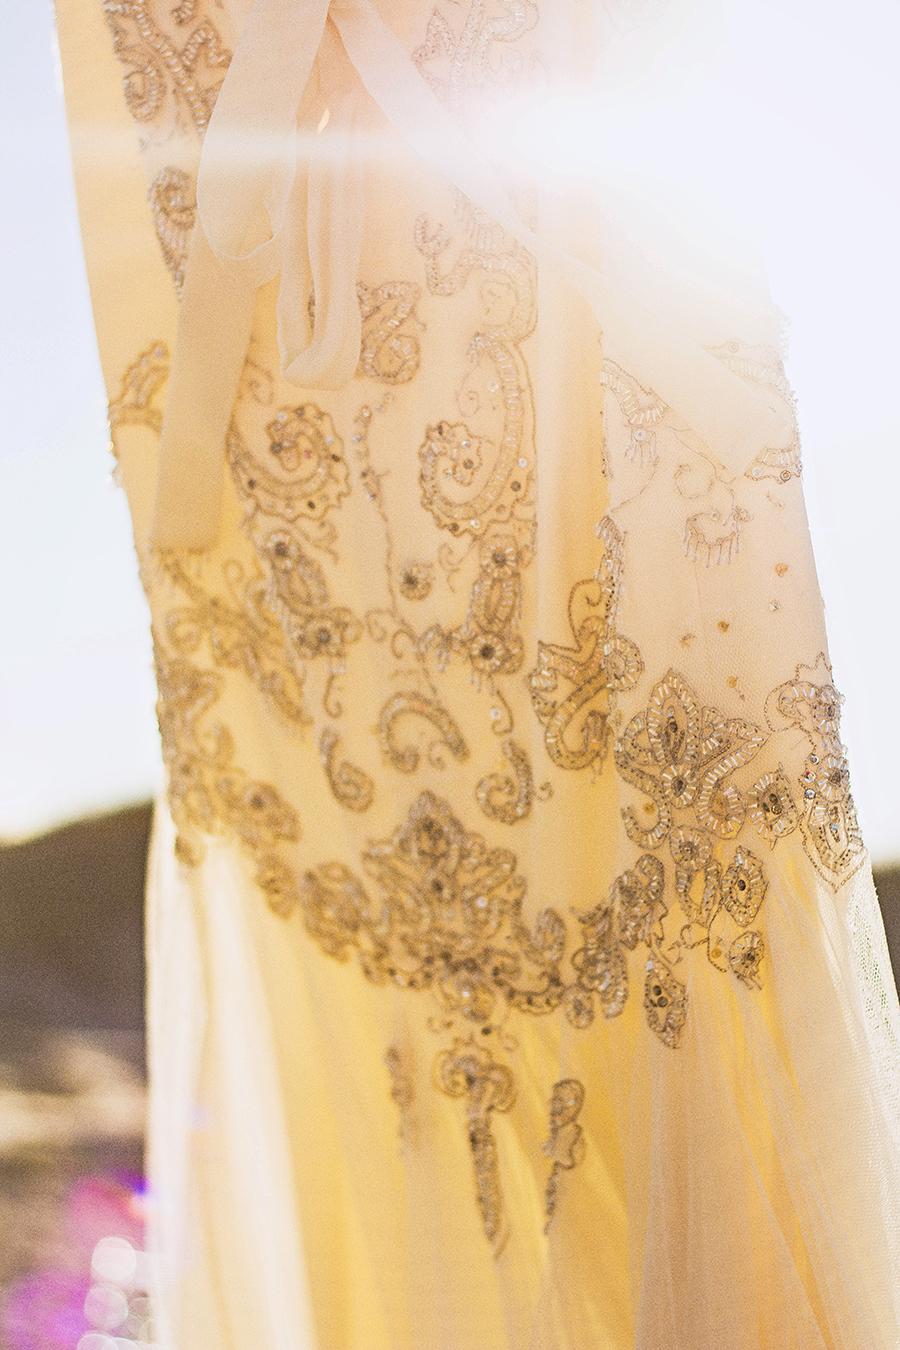 Vintage Wedding Gown | South Padre Island Wedding | JoAnna Dee Weddings